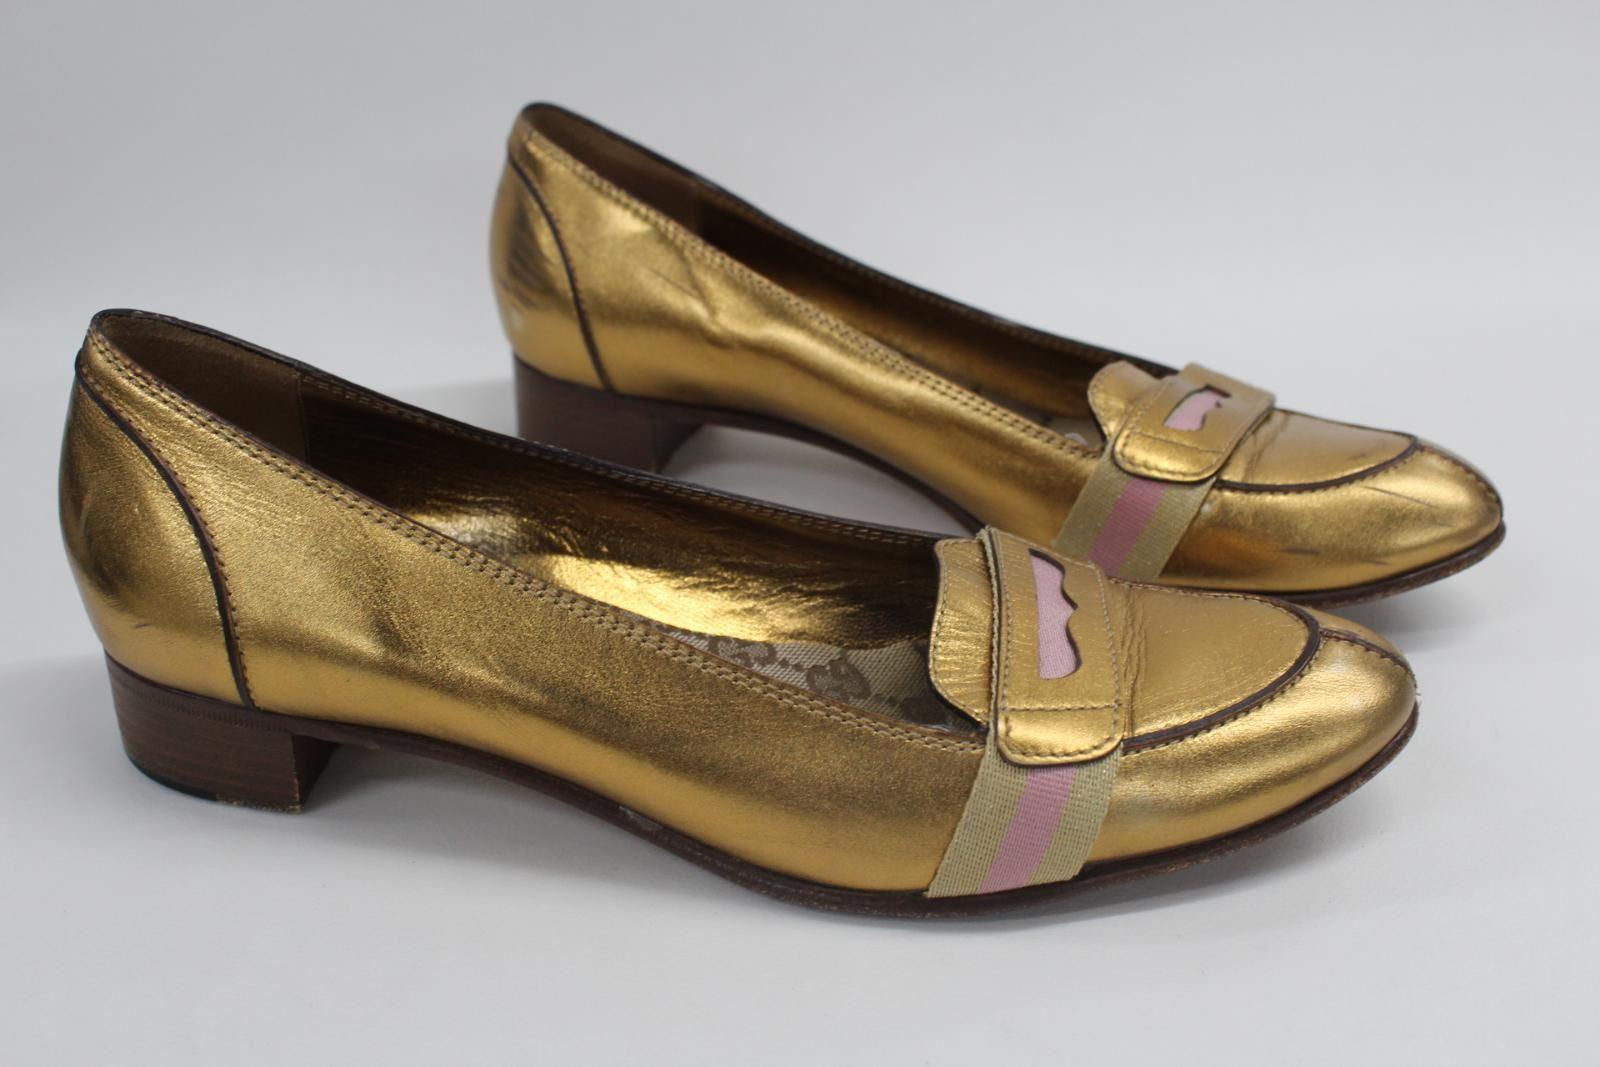 212a78ea9c7 GUCCI Ladies Metallic Slip On Low Heel Pumps Block Gold Leather Pink ...